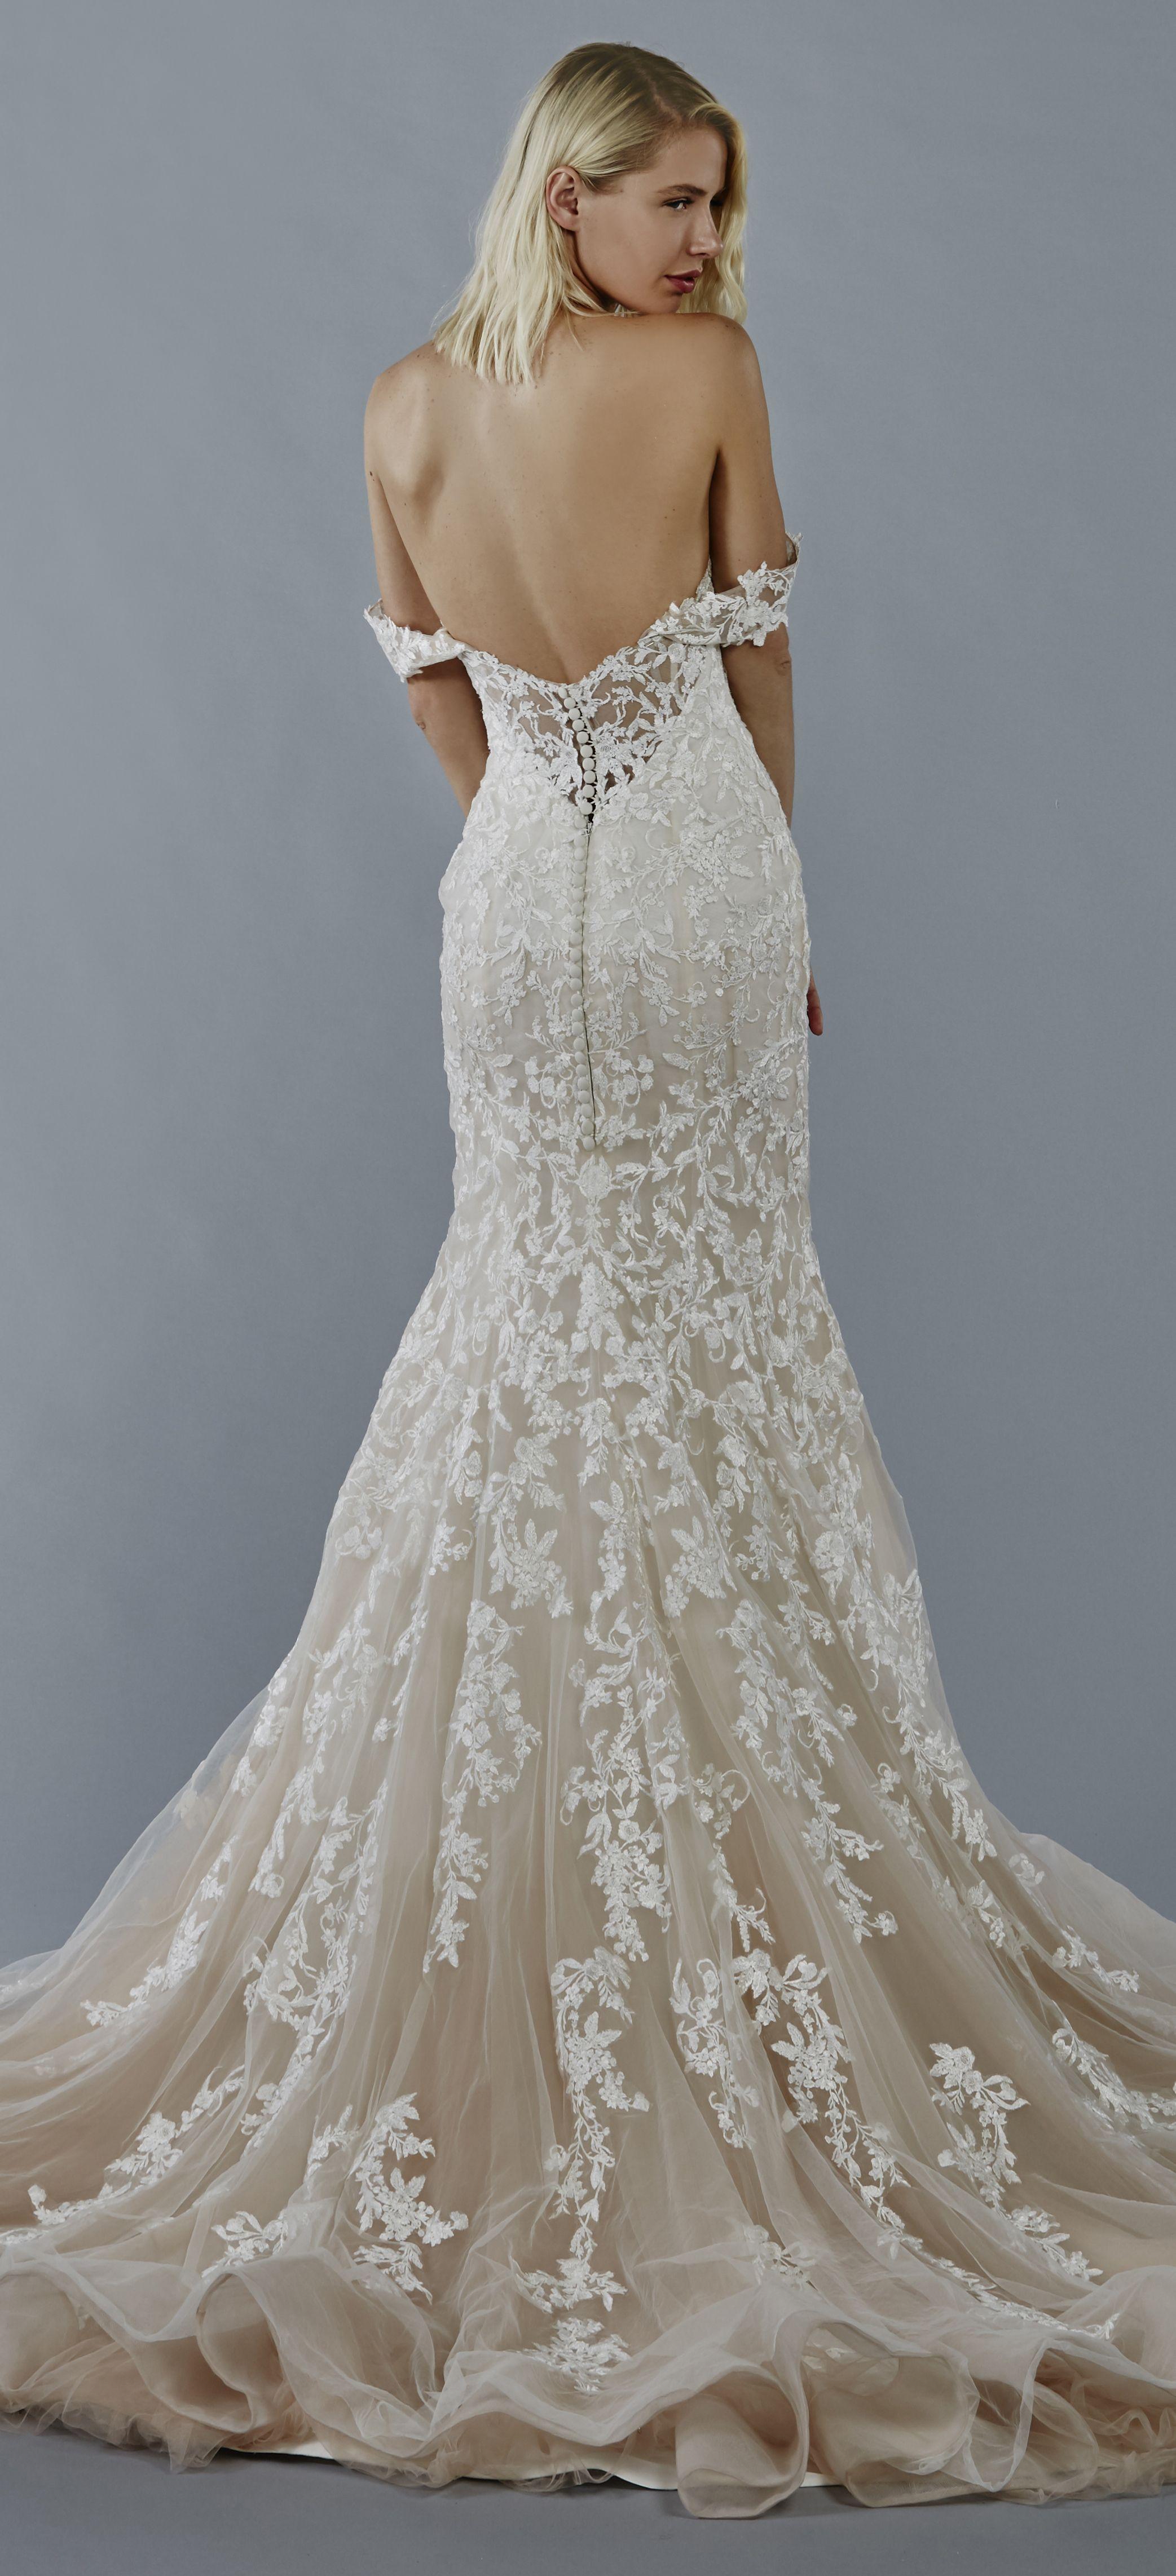 Luna wedding dress by kelly faetanini in blush ombre blush fit to